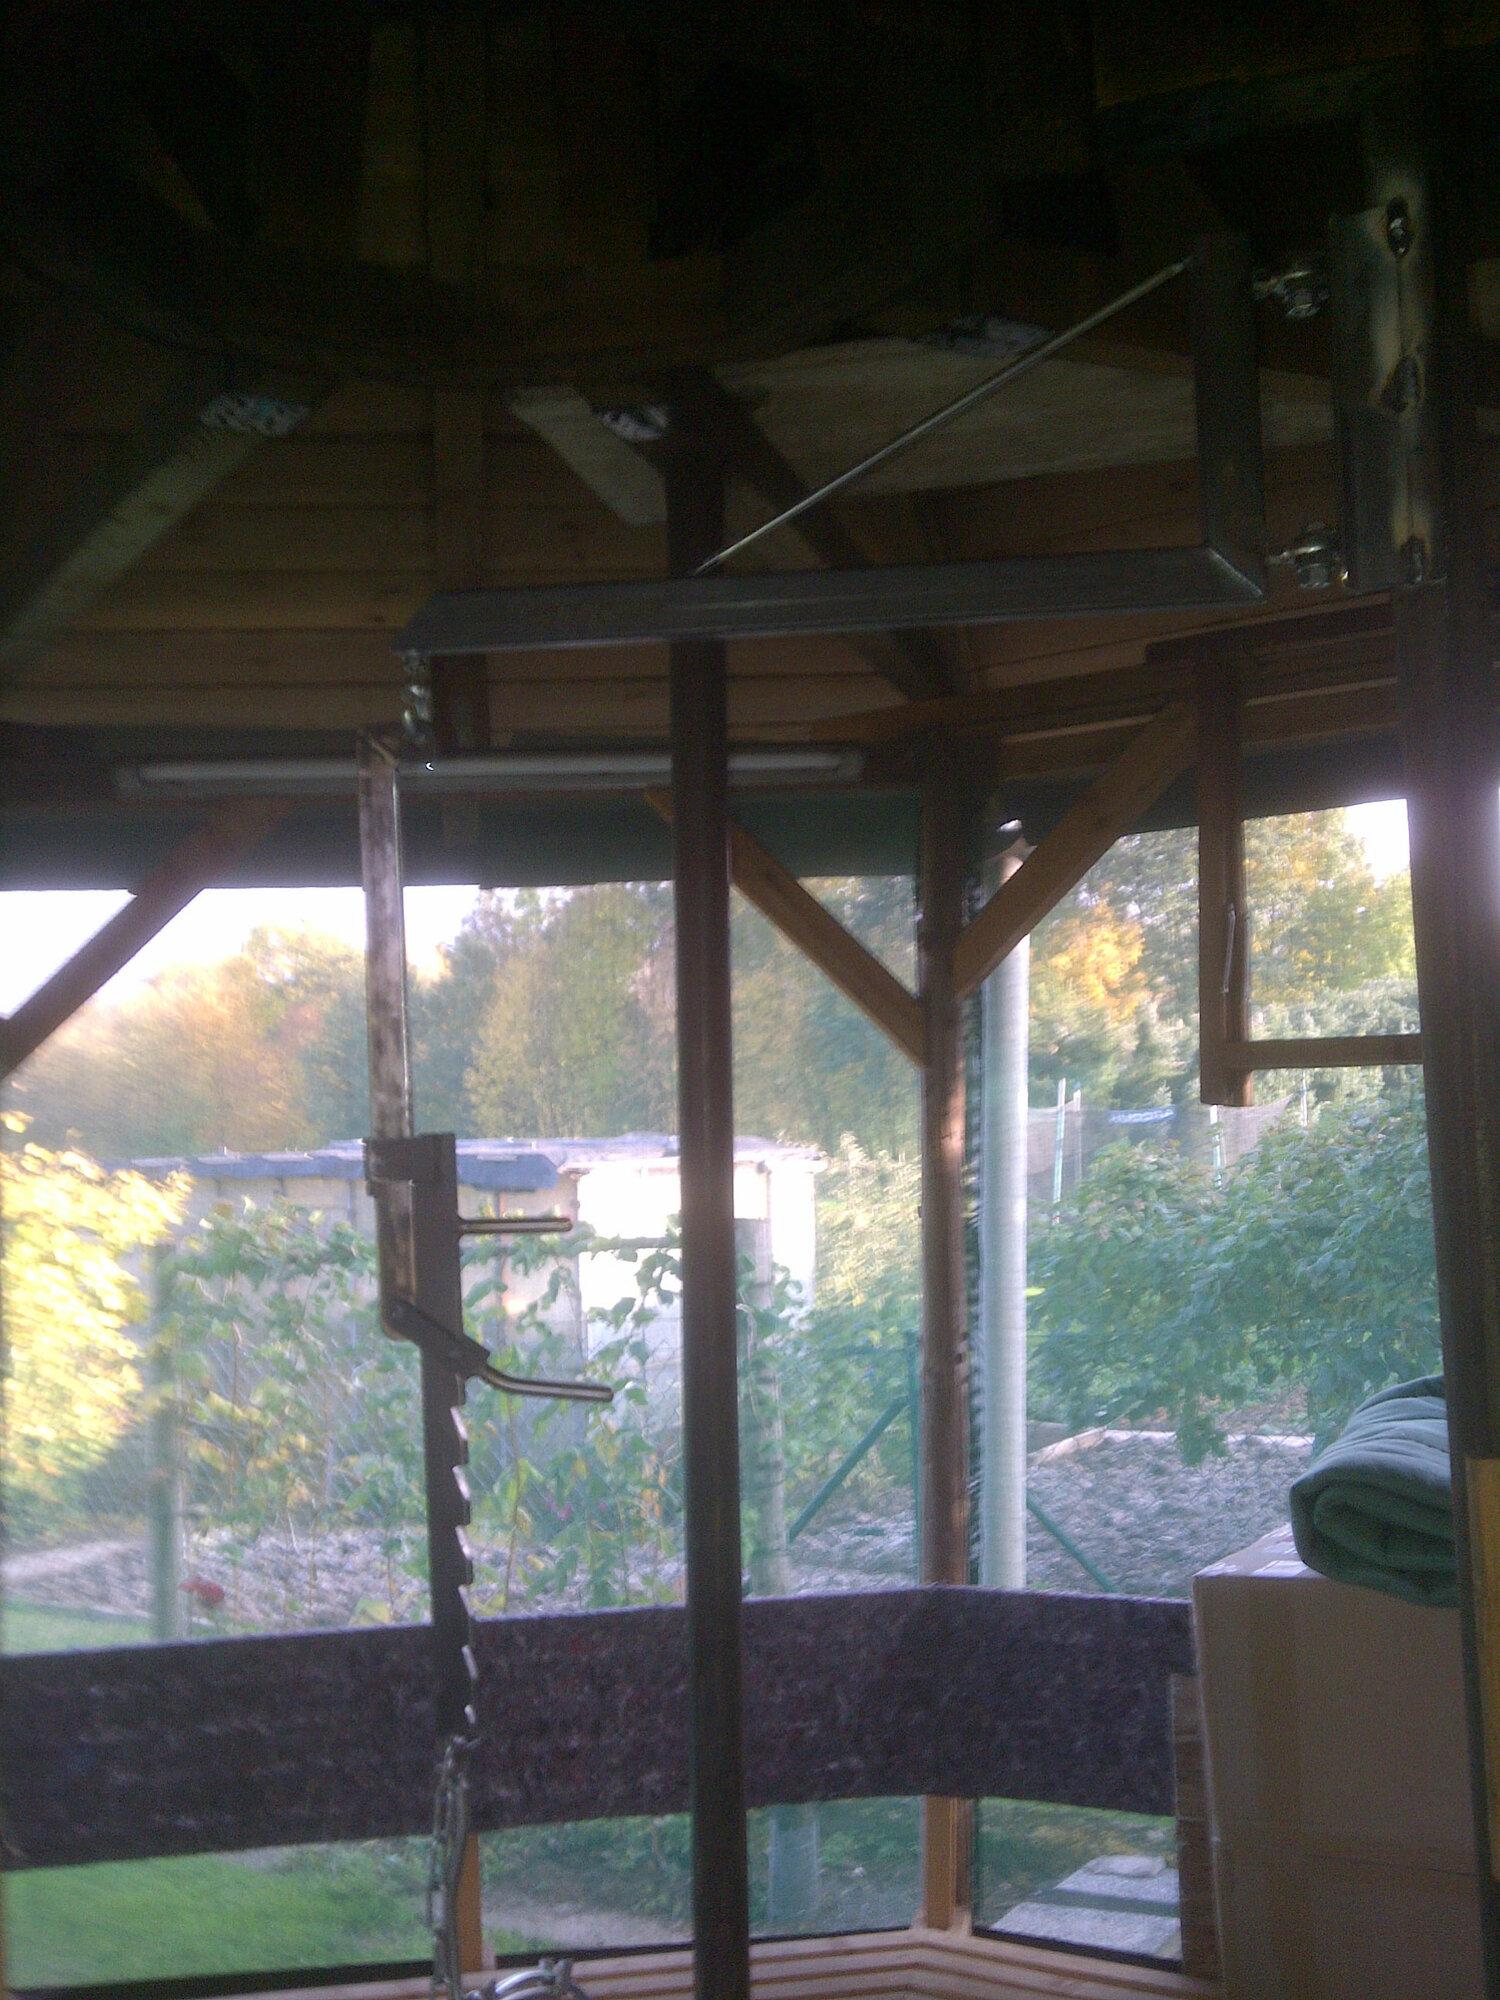 grillhütte18web.jpg